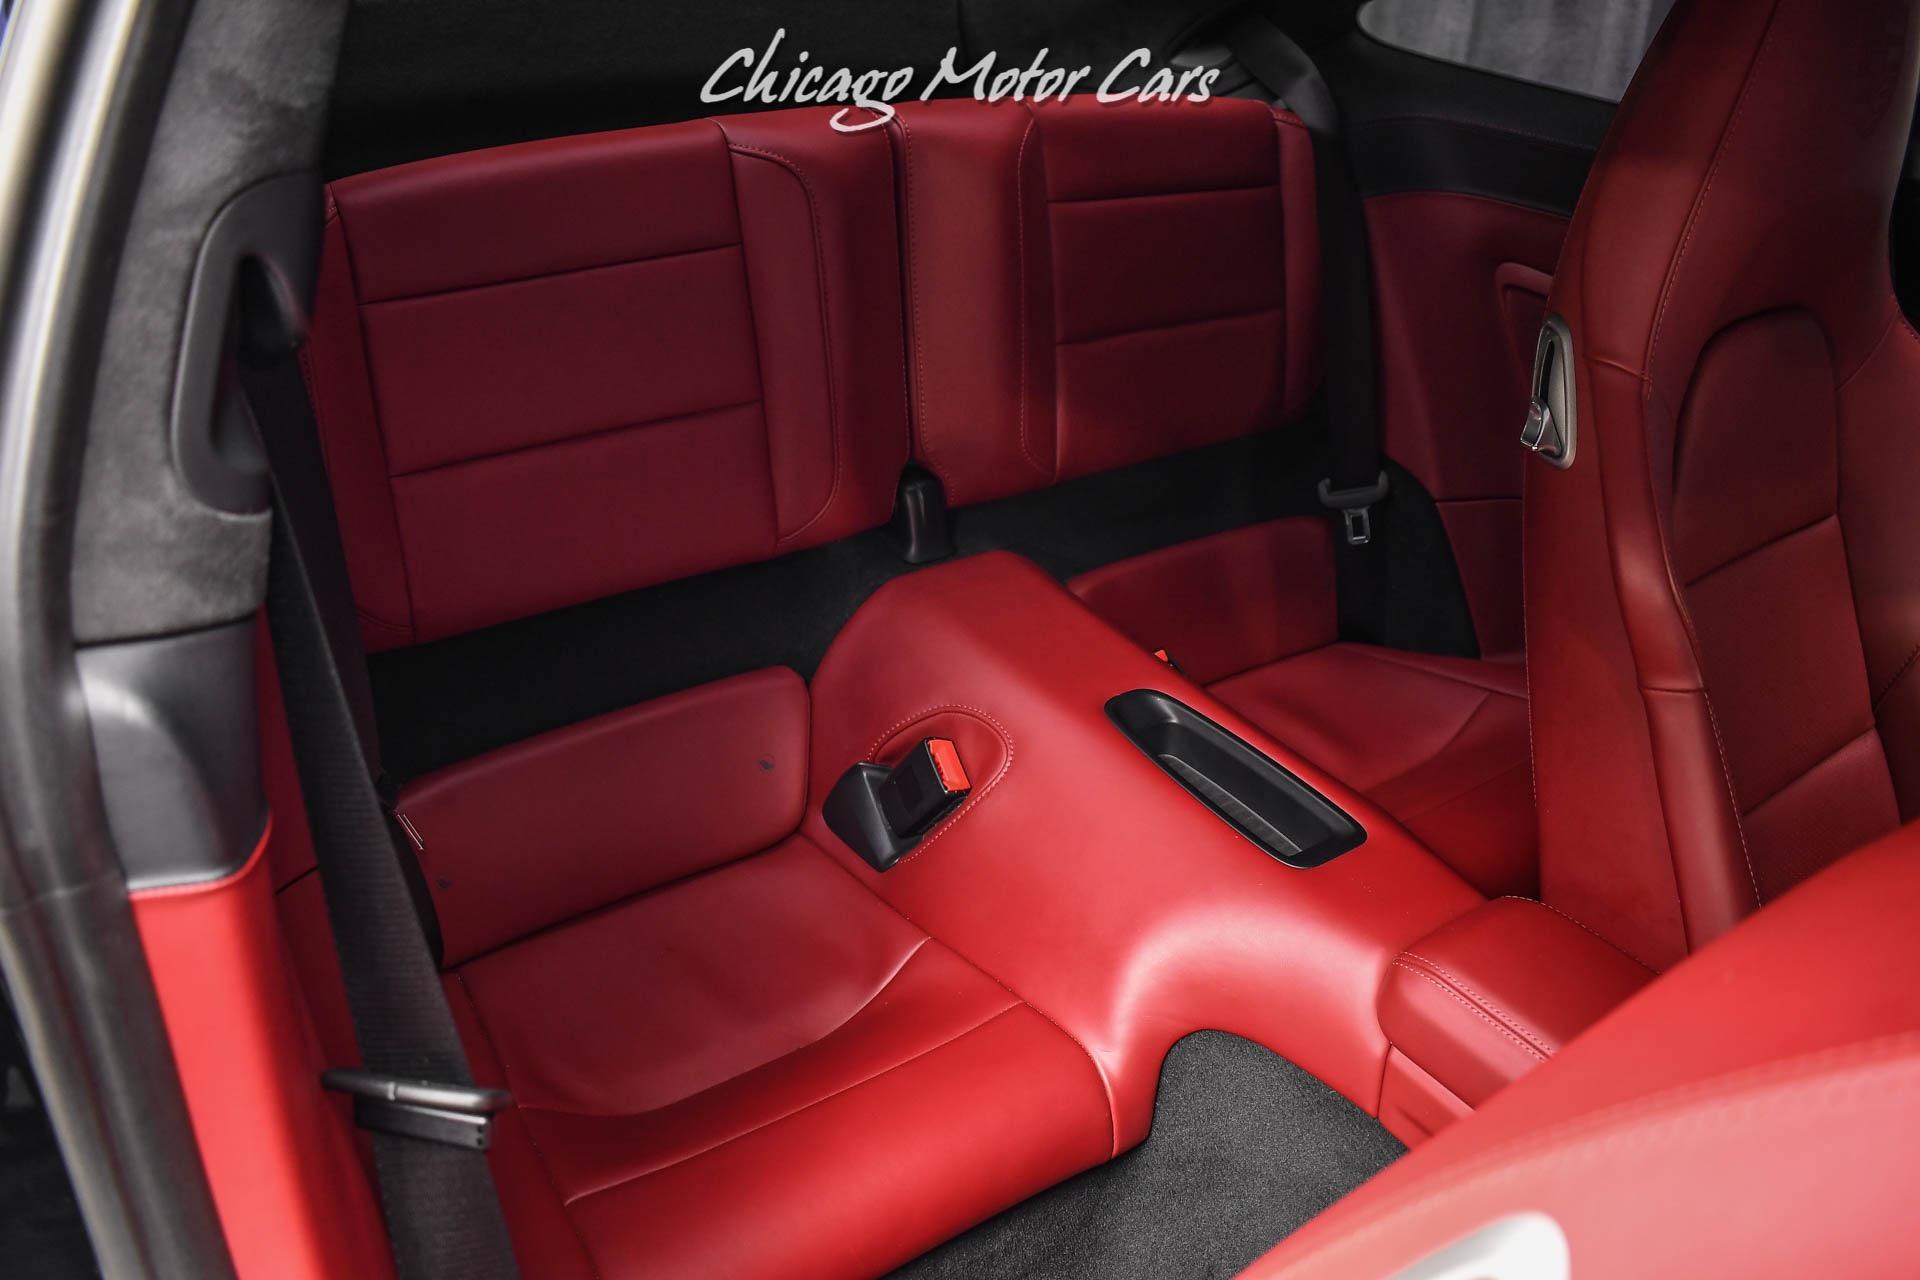 Used-2019-Porsche-911-Turbo-S-Coupe-Original-MSRP-248k-LOADED-HOT-COLOR-COMBO-TURBO-AERO-KIT